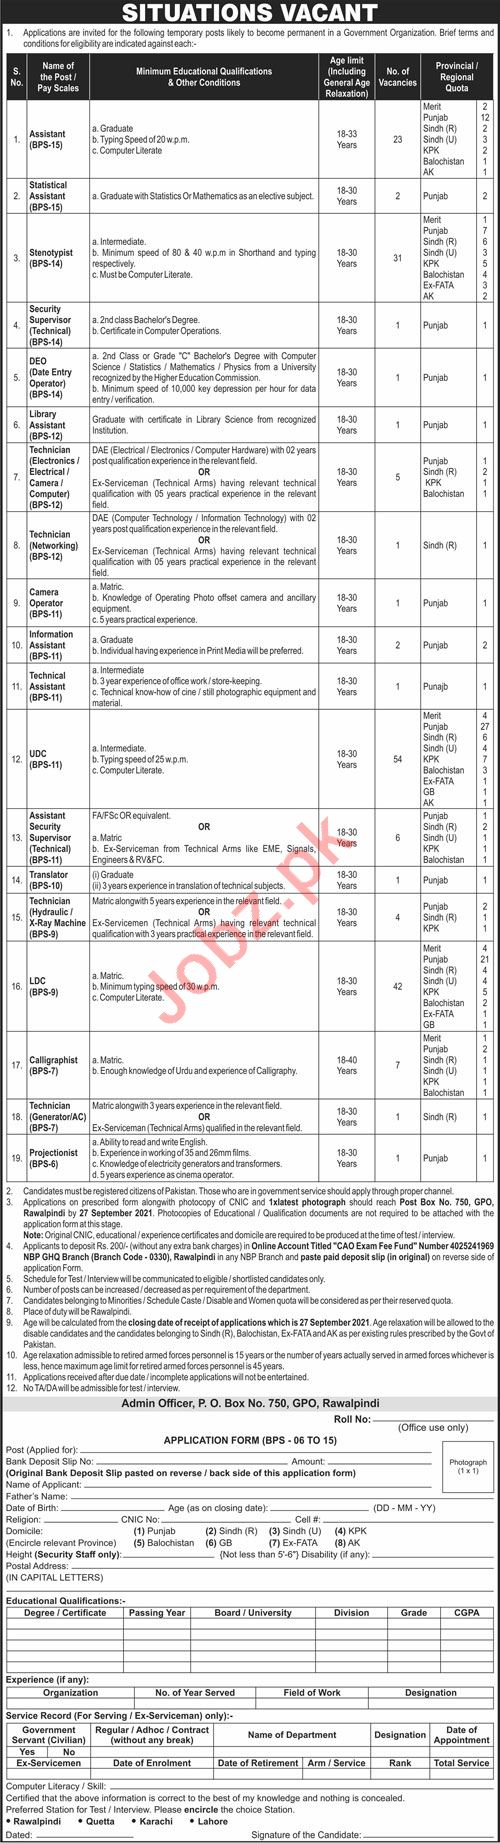 Post Box No 750 GPO Rawalpindi Jobs 2021 for Assistants